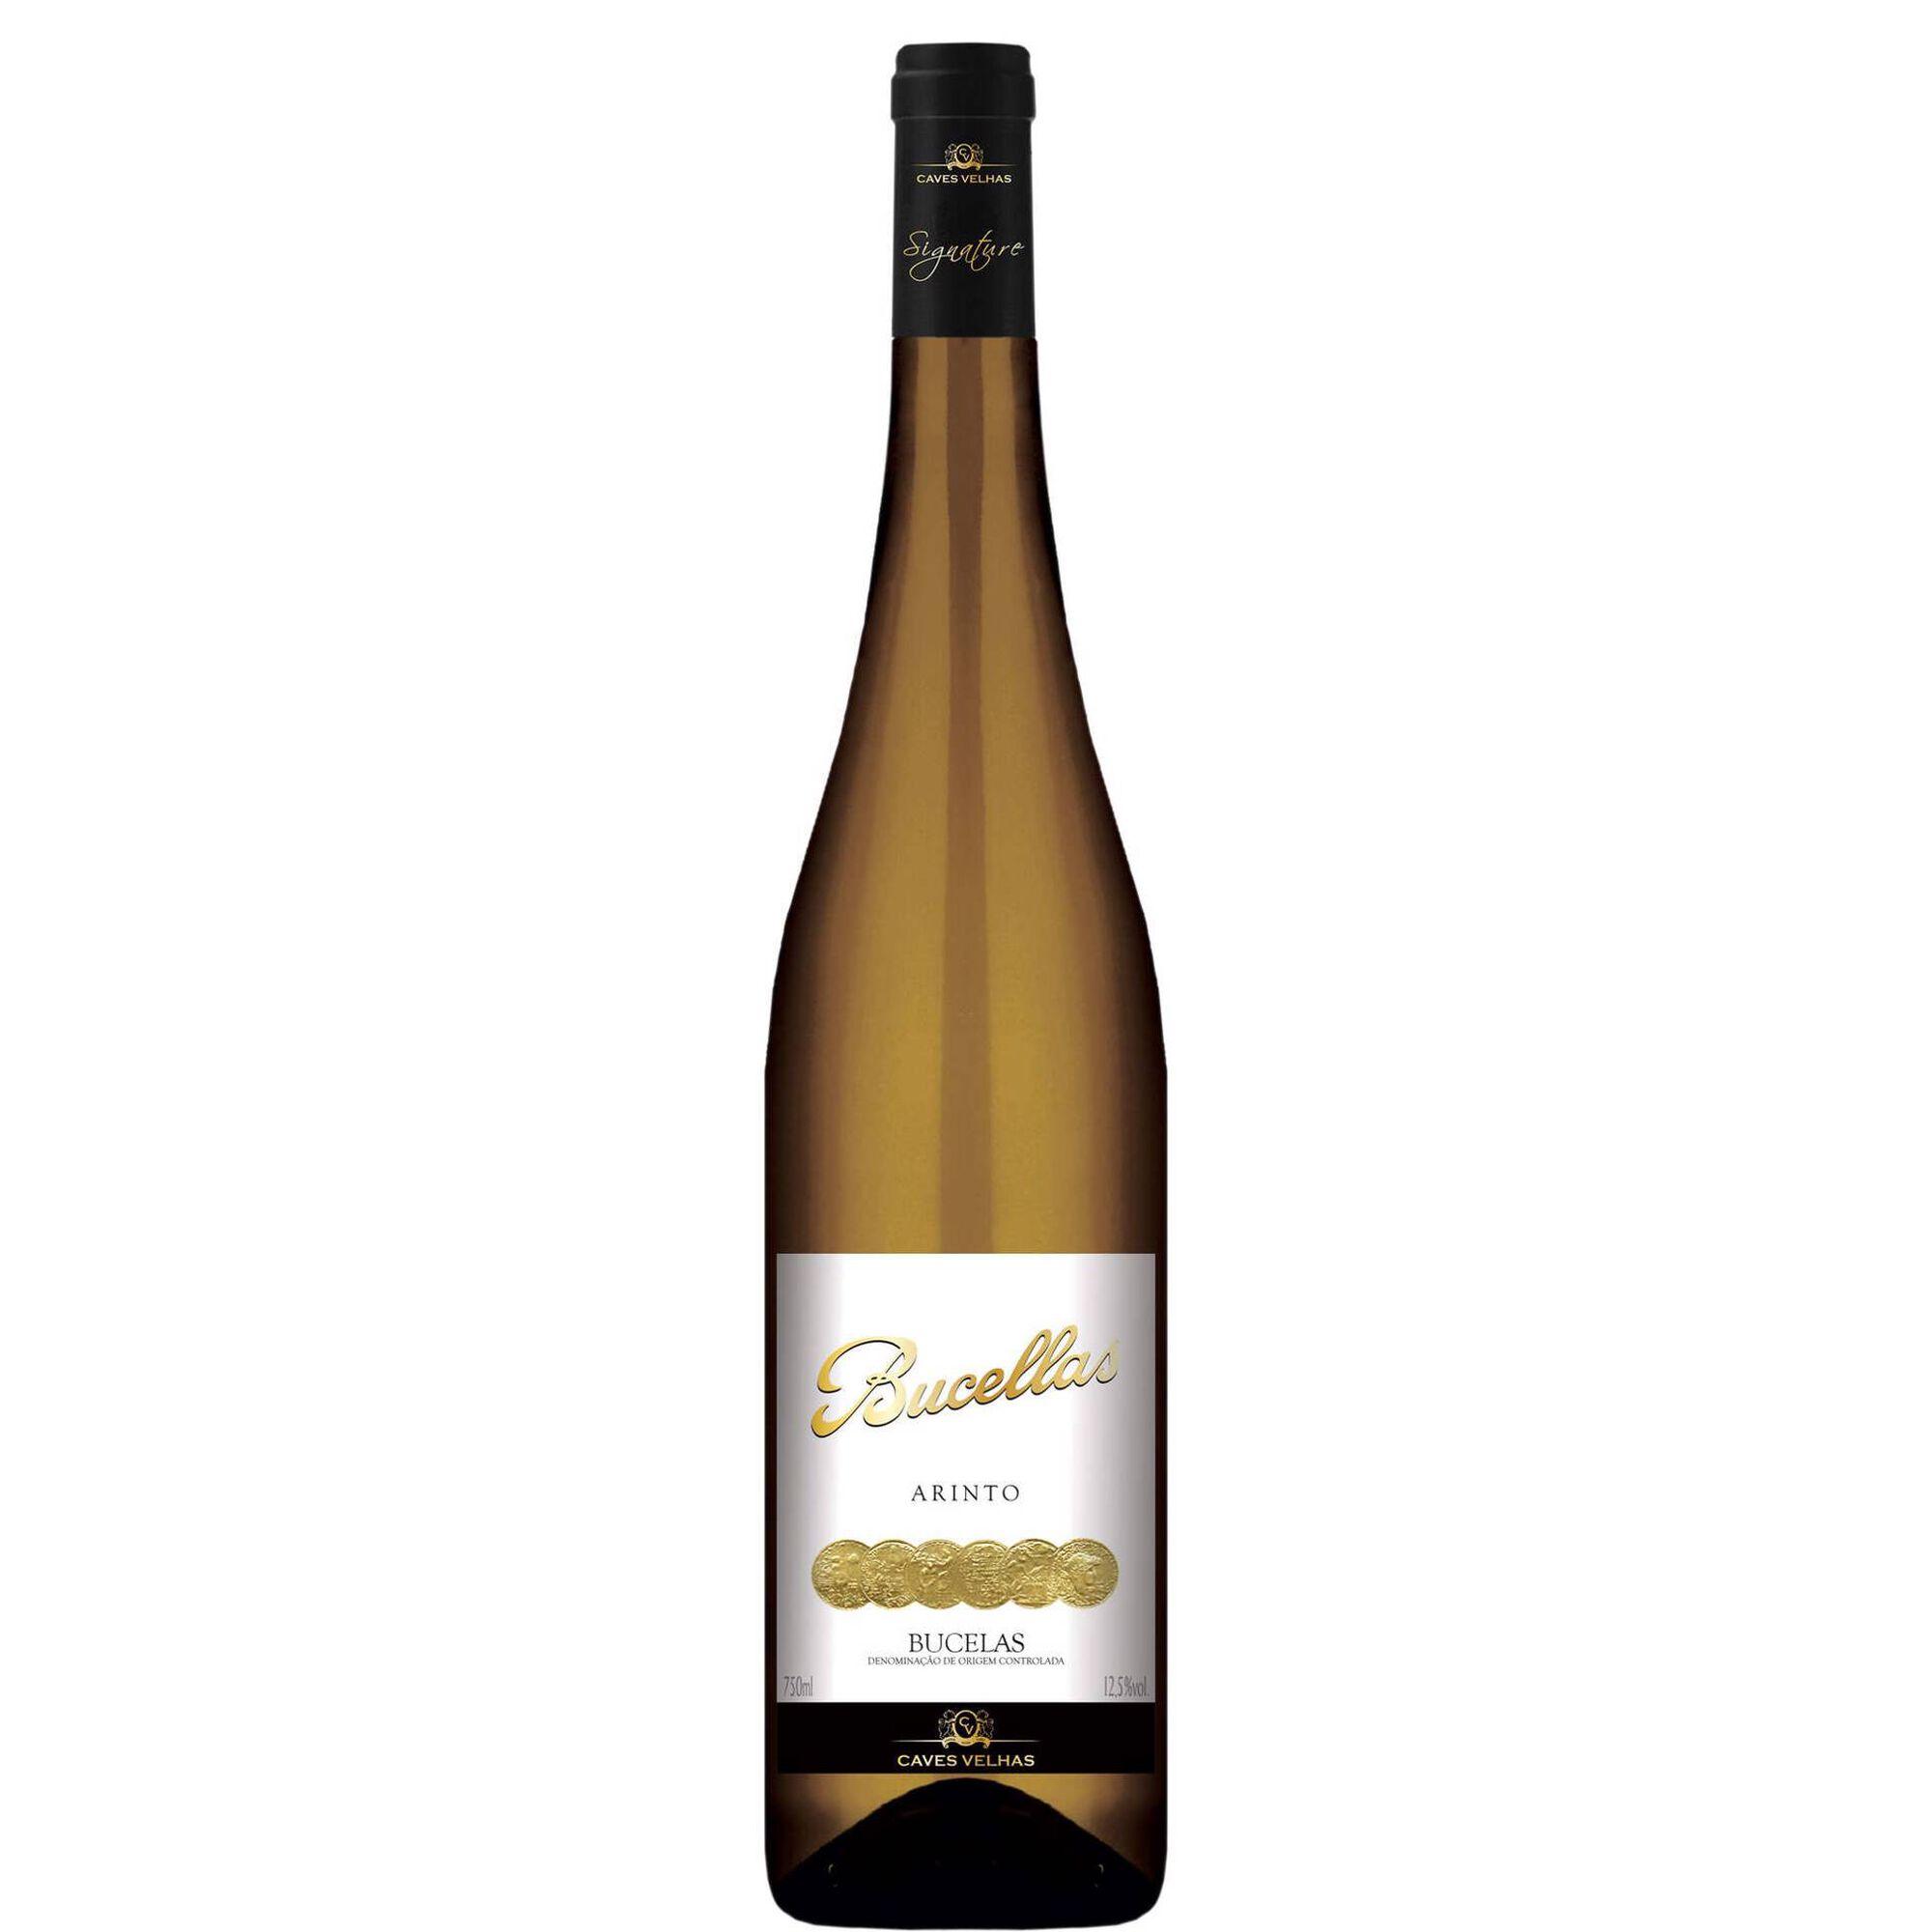 Bucellas Caves Velhas DOC Bucelas Vinho Branco